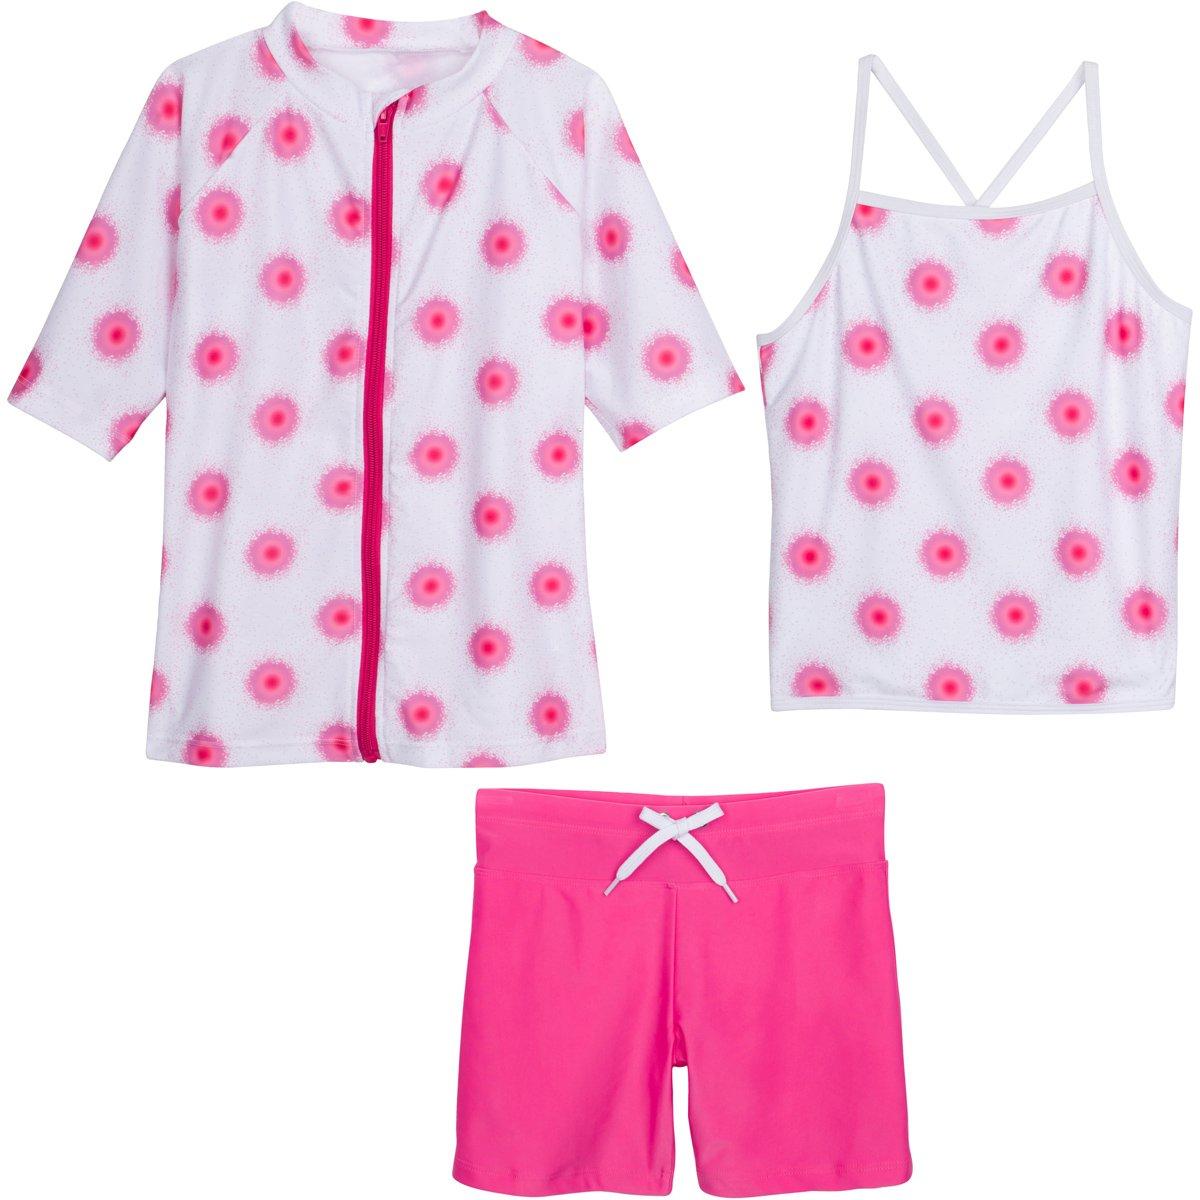 SwimZip Girls Short Sleeve Rash Guard Swim Shorts Set UPF 50+ Sun Protective Zipper Pink 12-14 SZISSSHORTSET3PC11